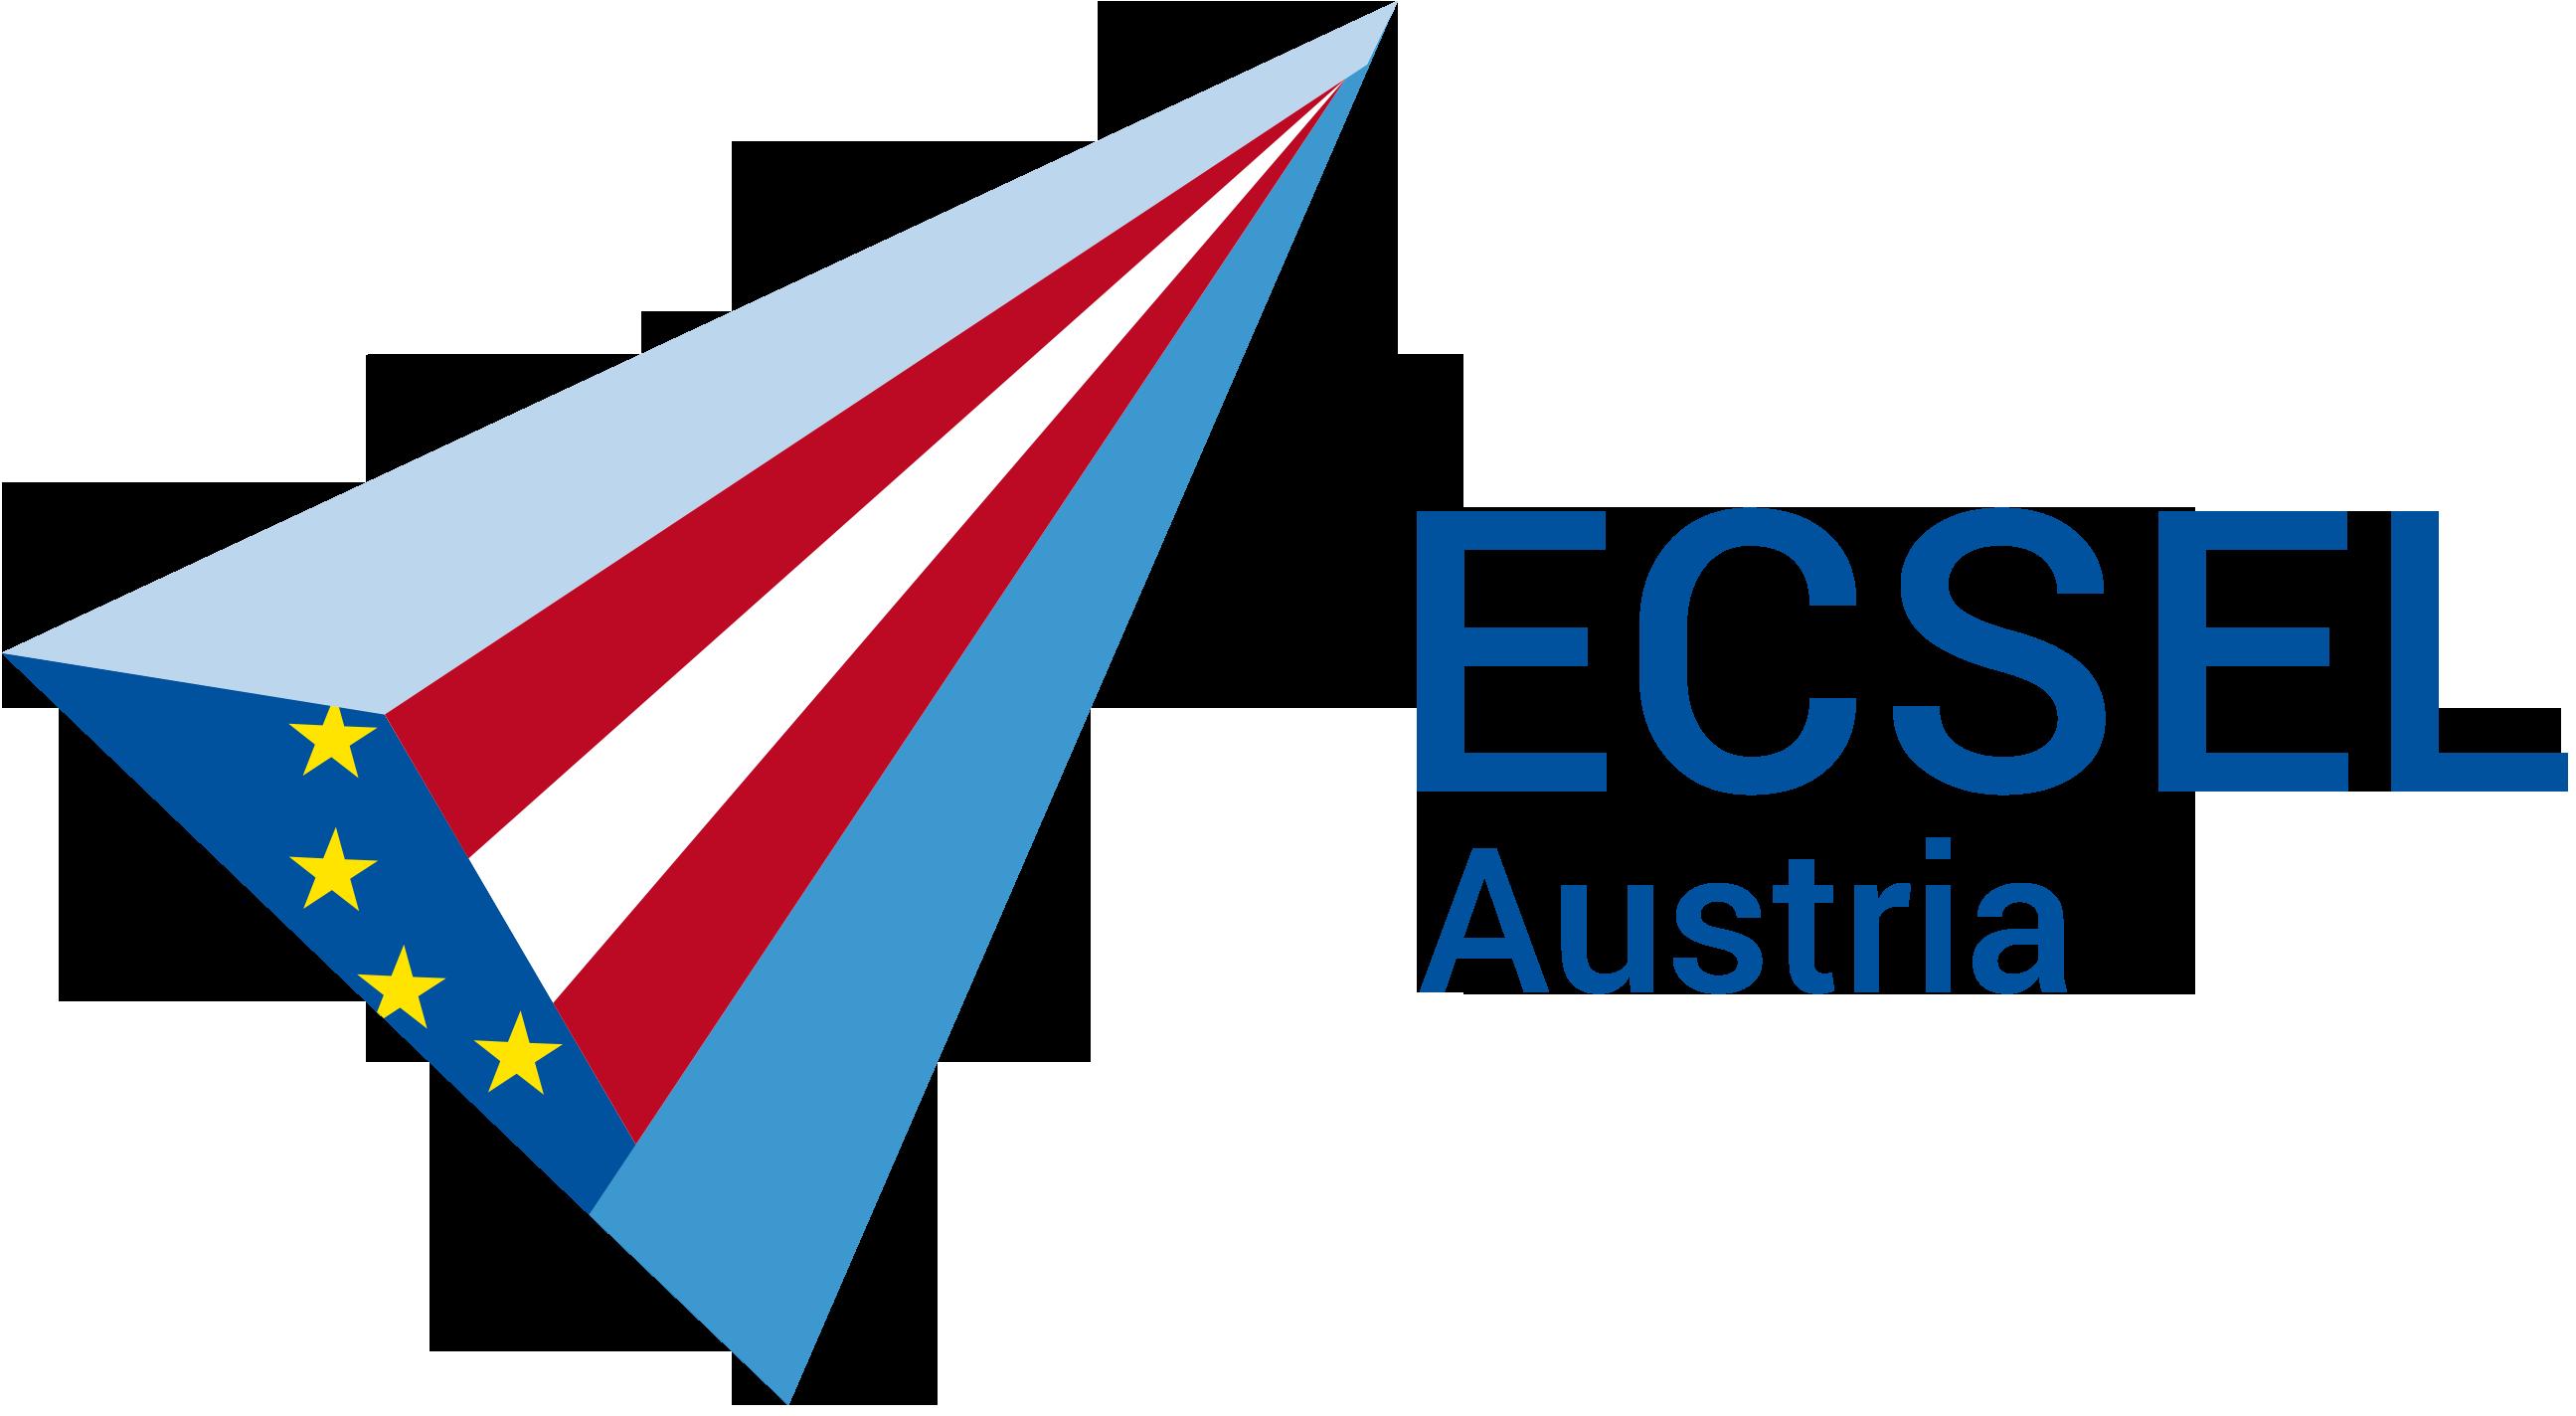 https://www.imagine-ikt.at/wp-content/uploads/logo_ECSEL_austria_RGB.png